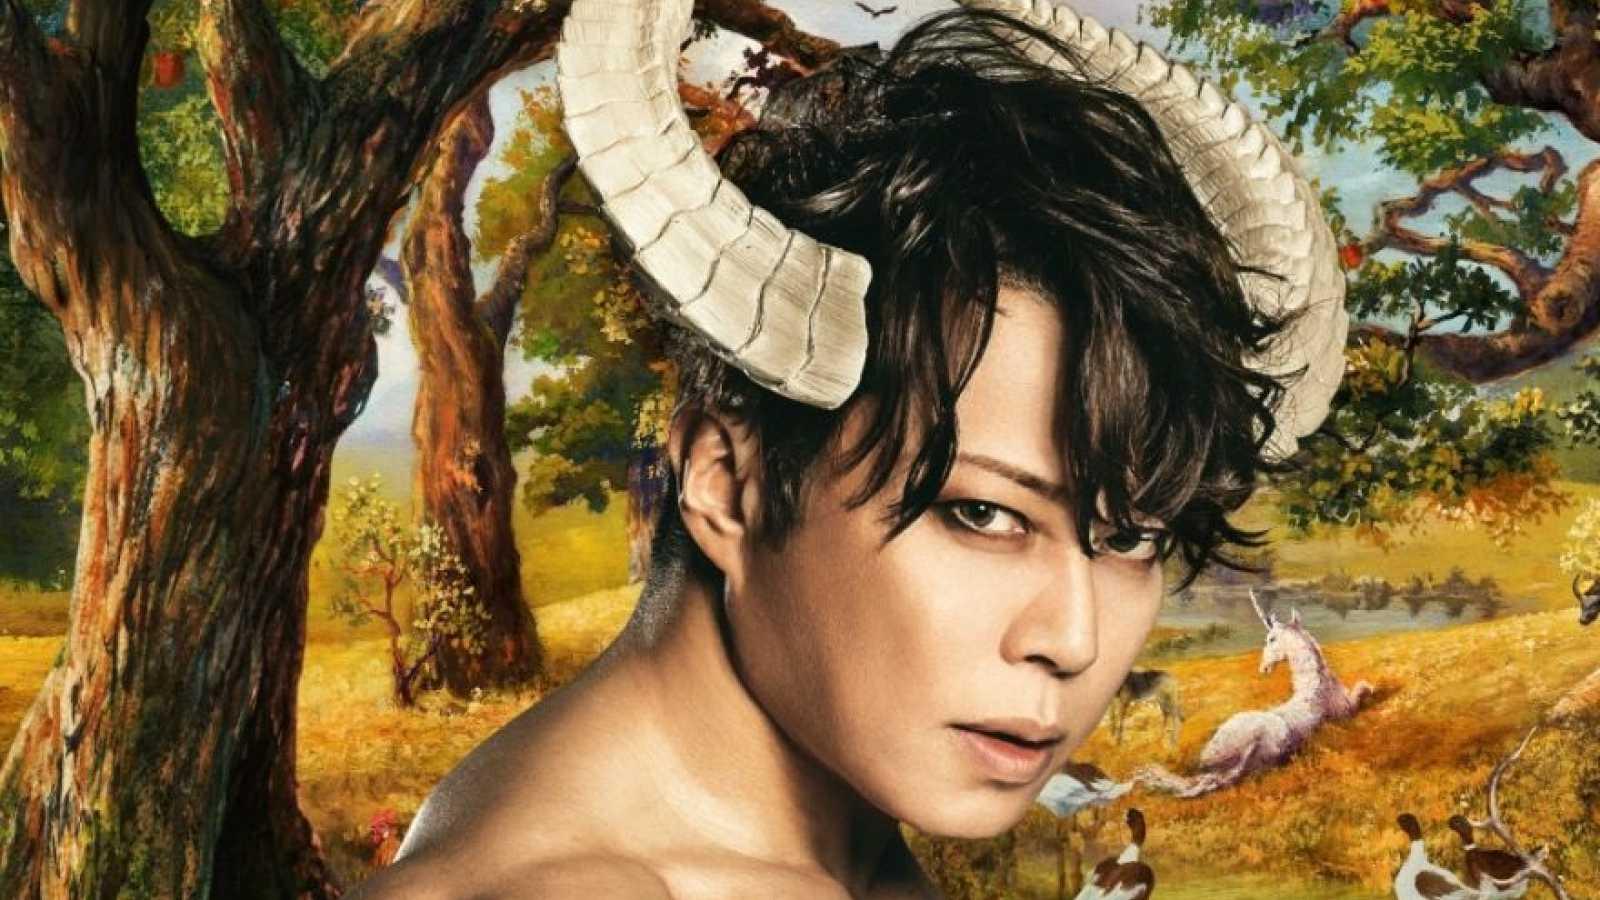 Nouveau single de Takanori Nishikawa © Sony Music Entertainment (Japan) Inc. All rights reserved.